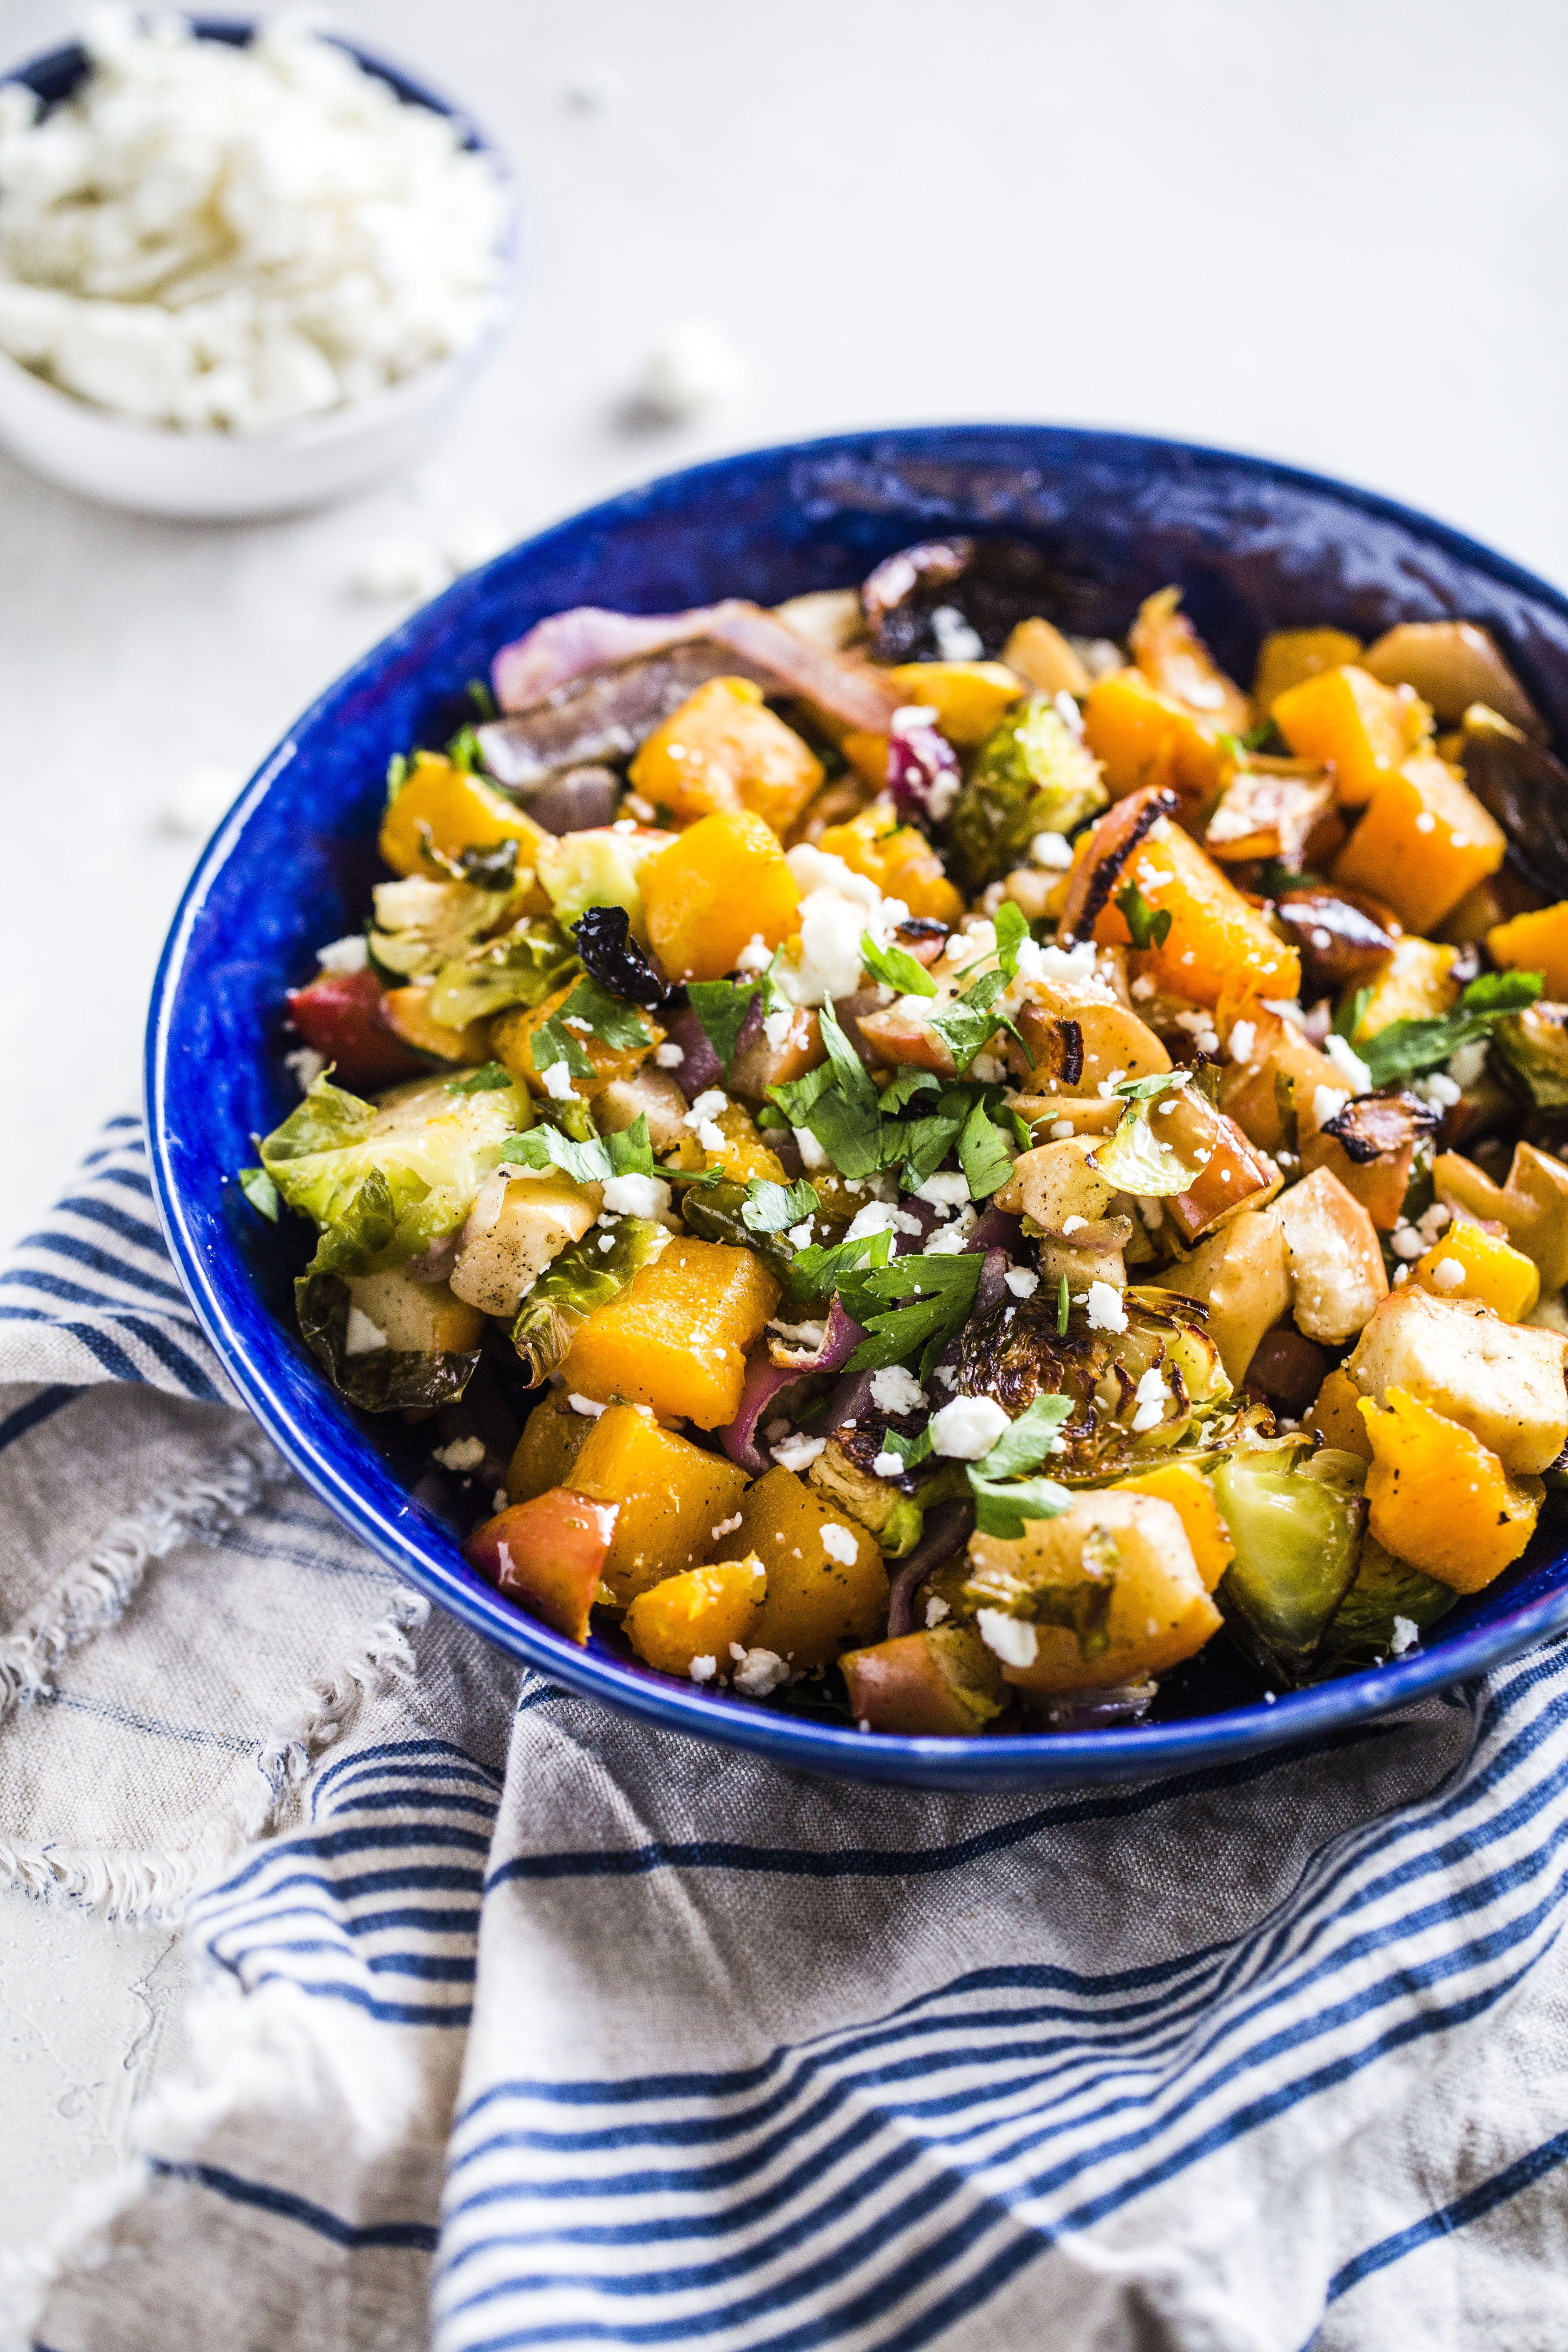 767a70e948bad2f8ac4f882c9bb6292b - Rezepte Salat